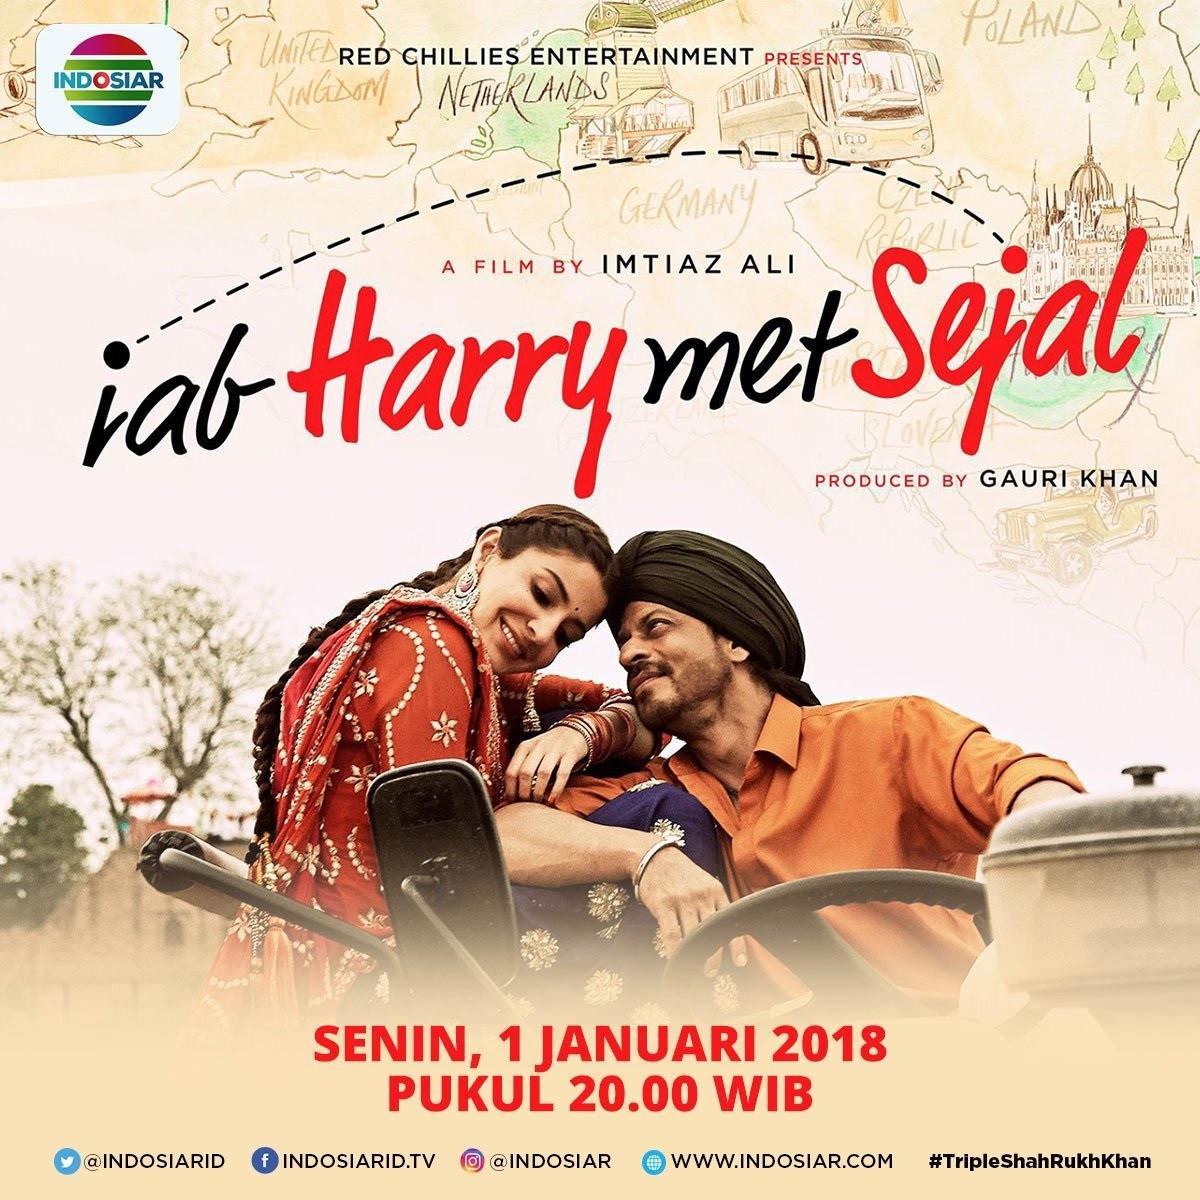 Film Shah Rukh Khan, Jab Harry Met Sejal.